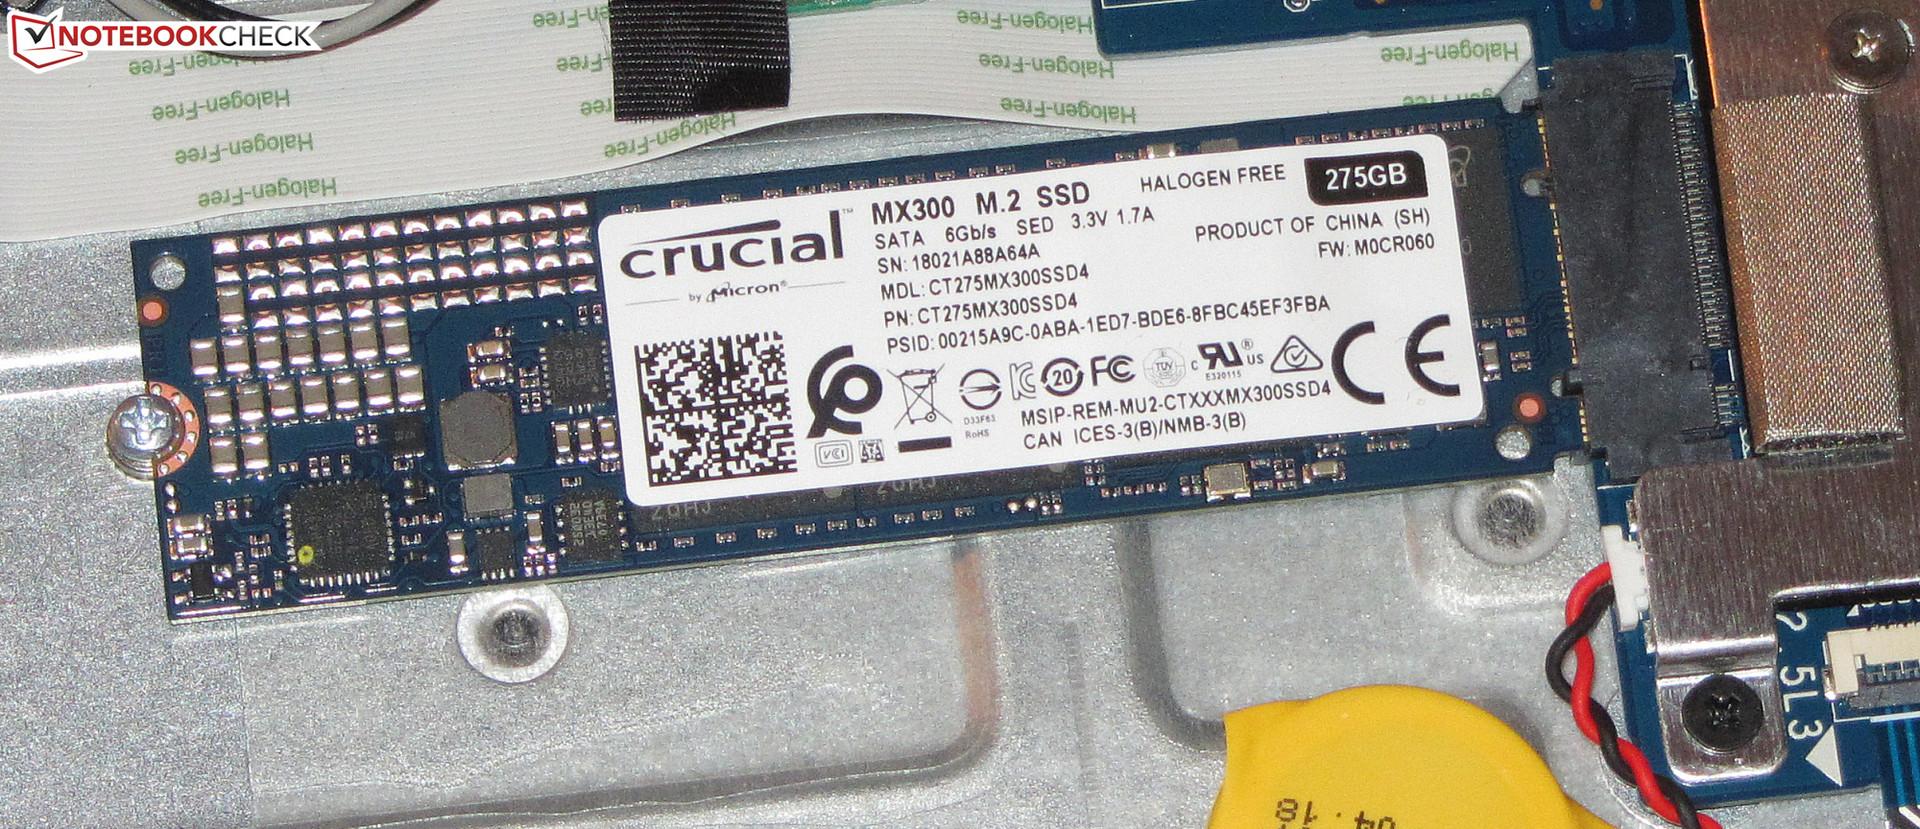 Lenovo IdeaPad 100s-14IBR (N3060, HD 400) Laptop Review